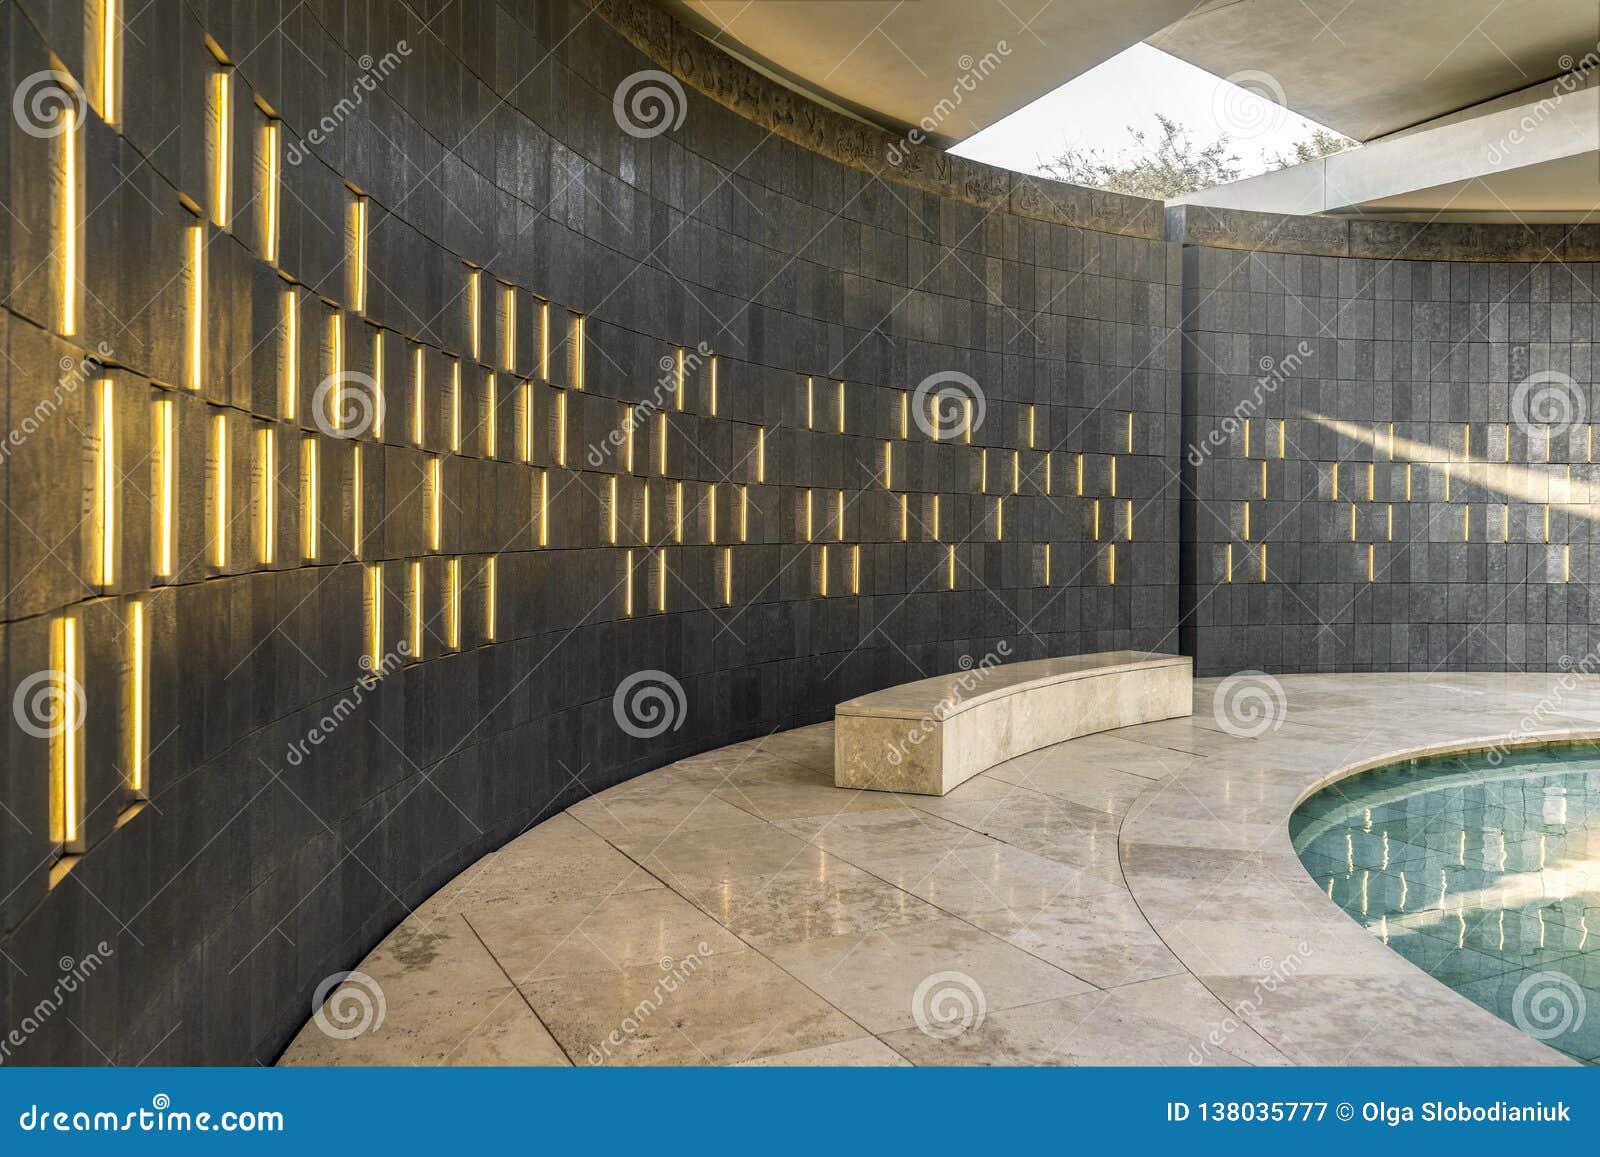 Wahat Al Karama - Pavillion da honra, interior, Abu Dhabi, outubro 2018